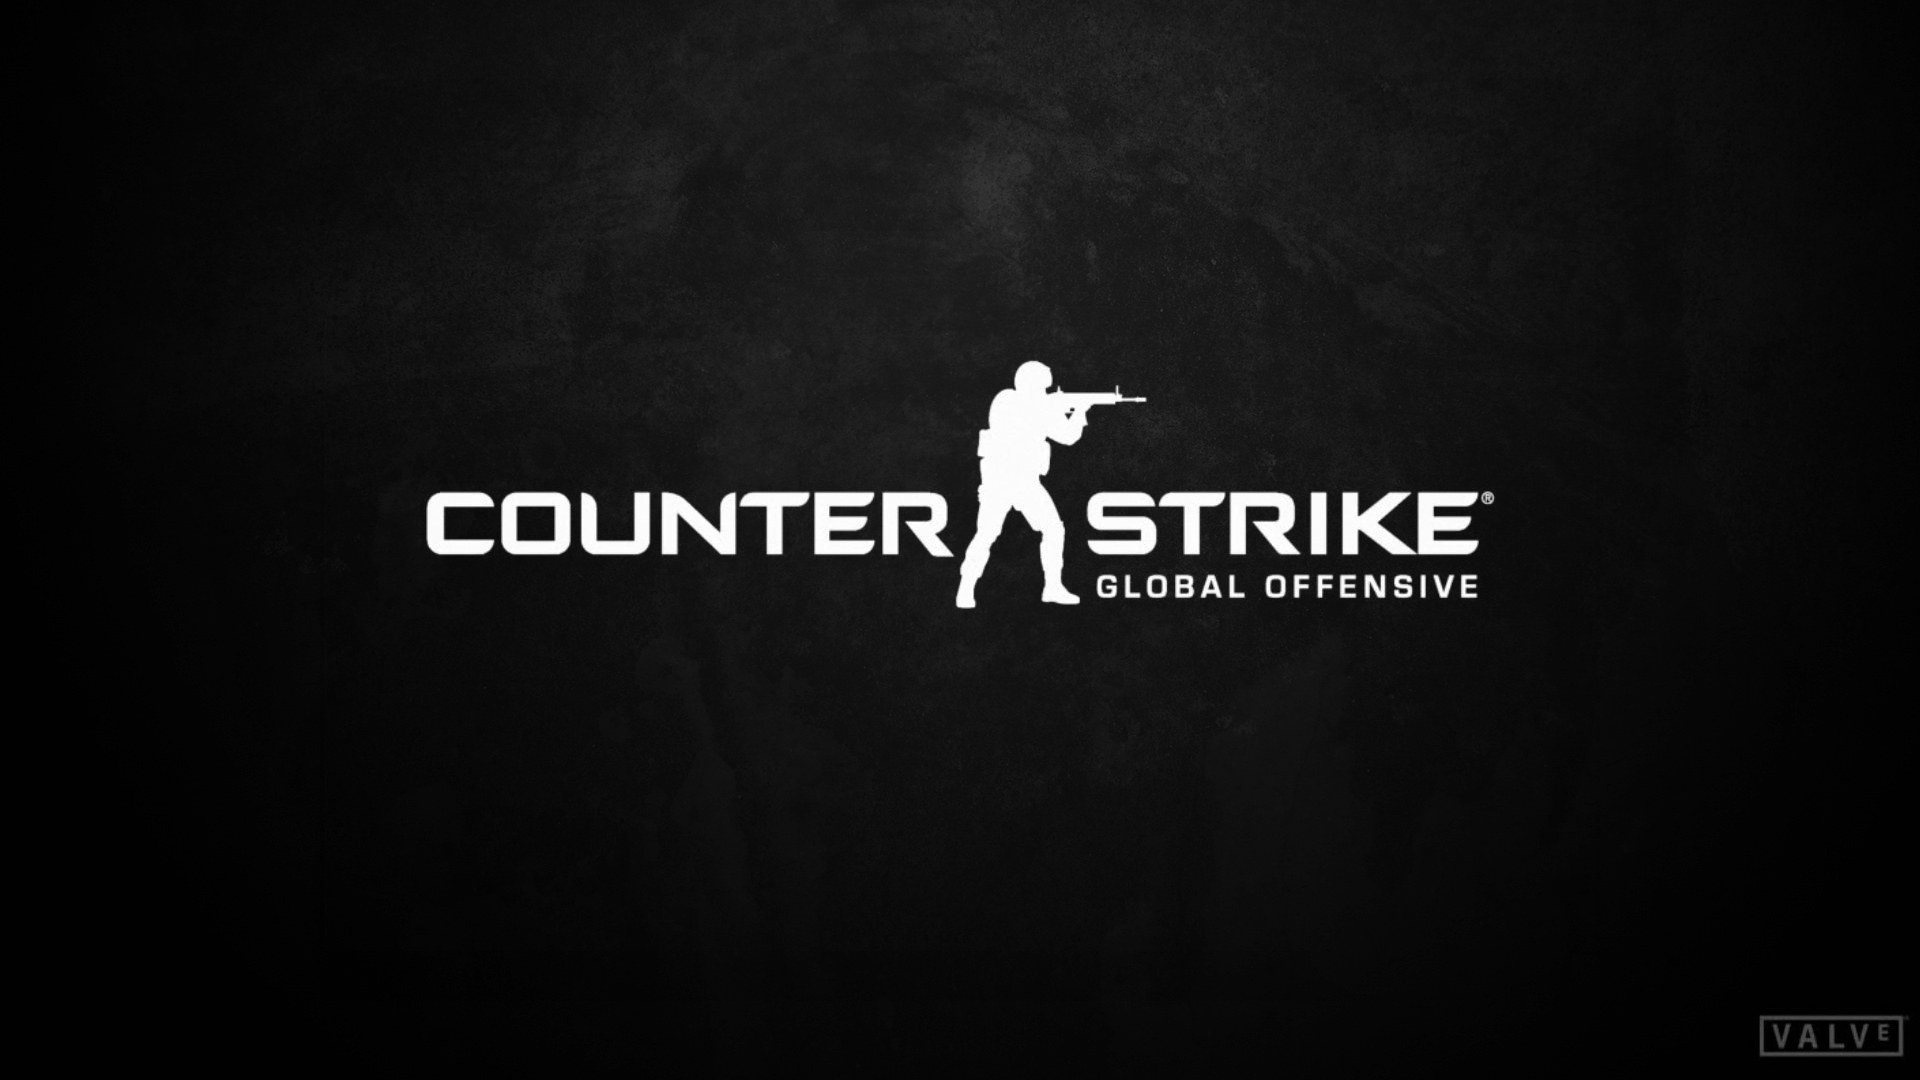 Wallpaper #13 Tapeta na pulpit Counter-Strike: Global Offensive